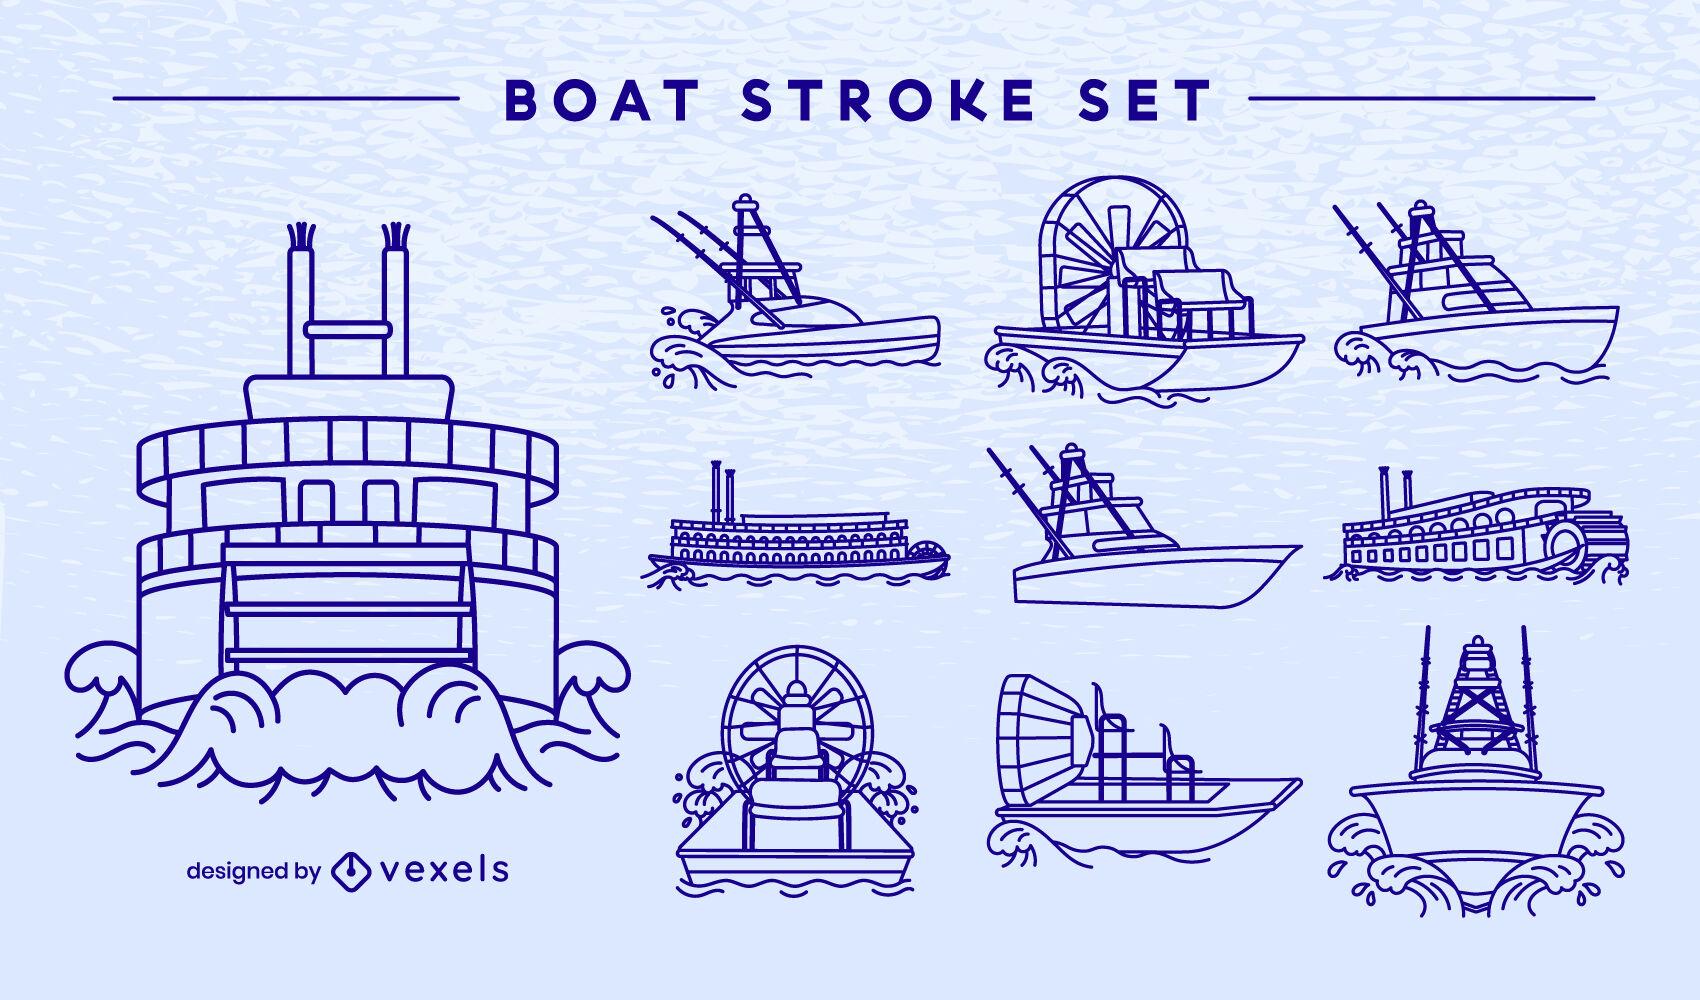 Boats and ships stroke set